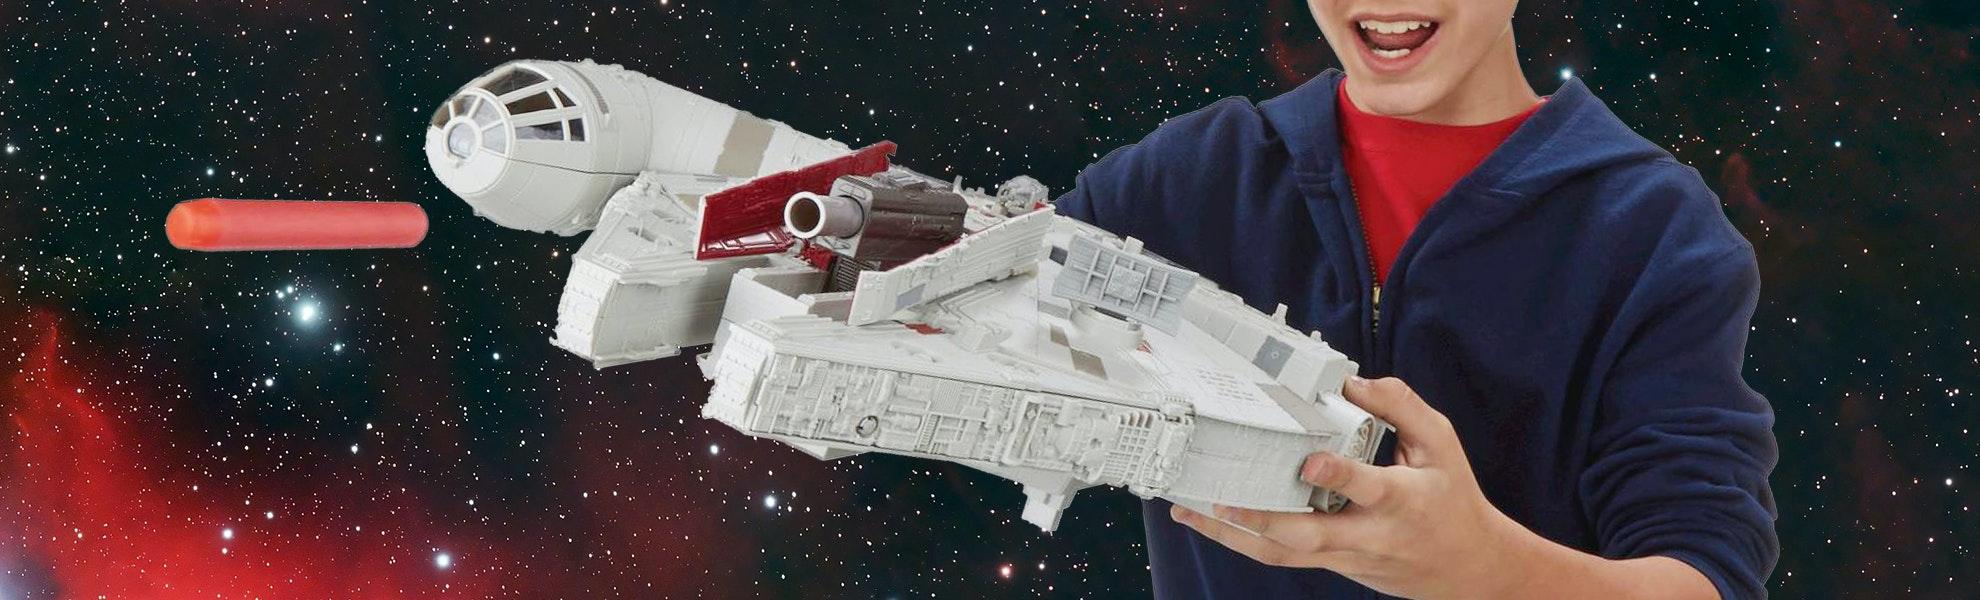 Star Wars: TFA - Battle Action Millenium Falcon